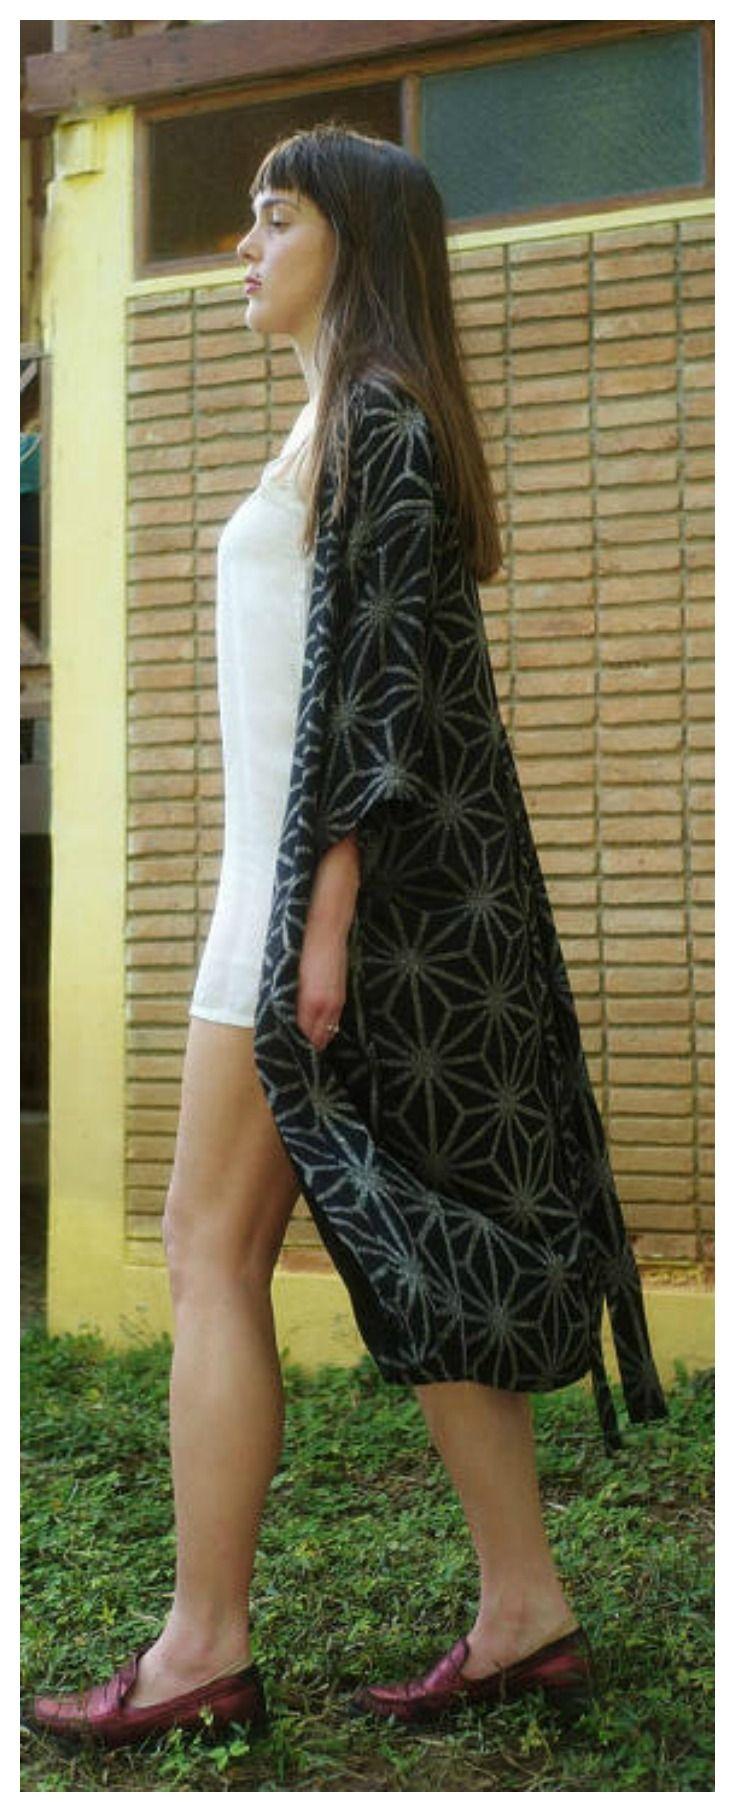 Long Kimono robe on Etsy for only 48$ !!! Enjoy the offer         kimono robe long, kimono robe cotton, kimono robe, bohemian kimono robe, kimono cardigan, cardigan kimono, kimono cardigan boho, kimono